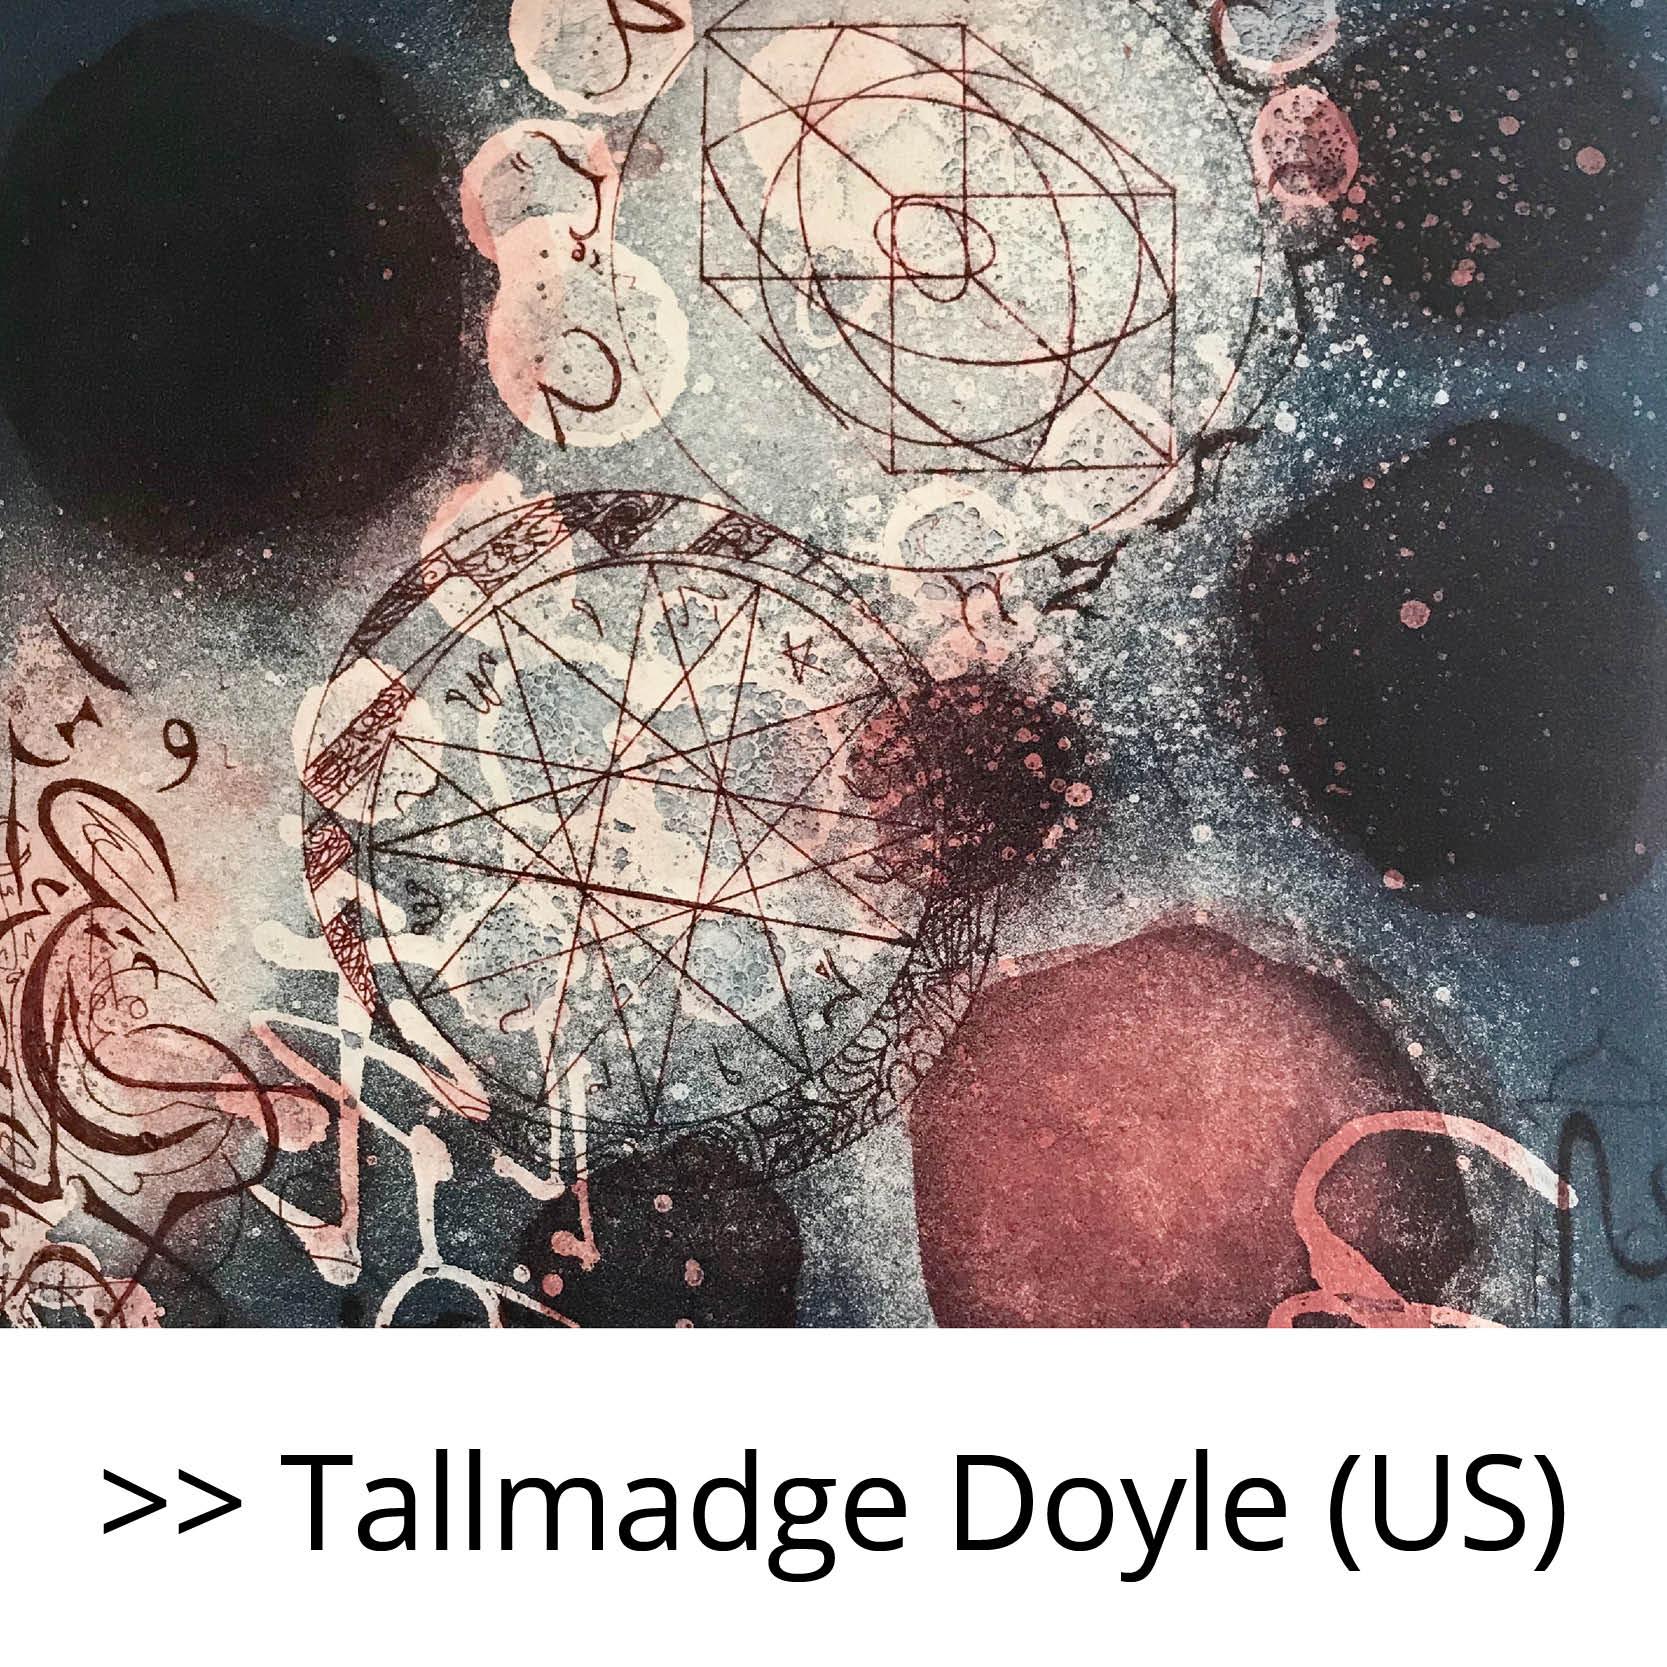 Tallmadge_Doyle_(US)